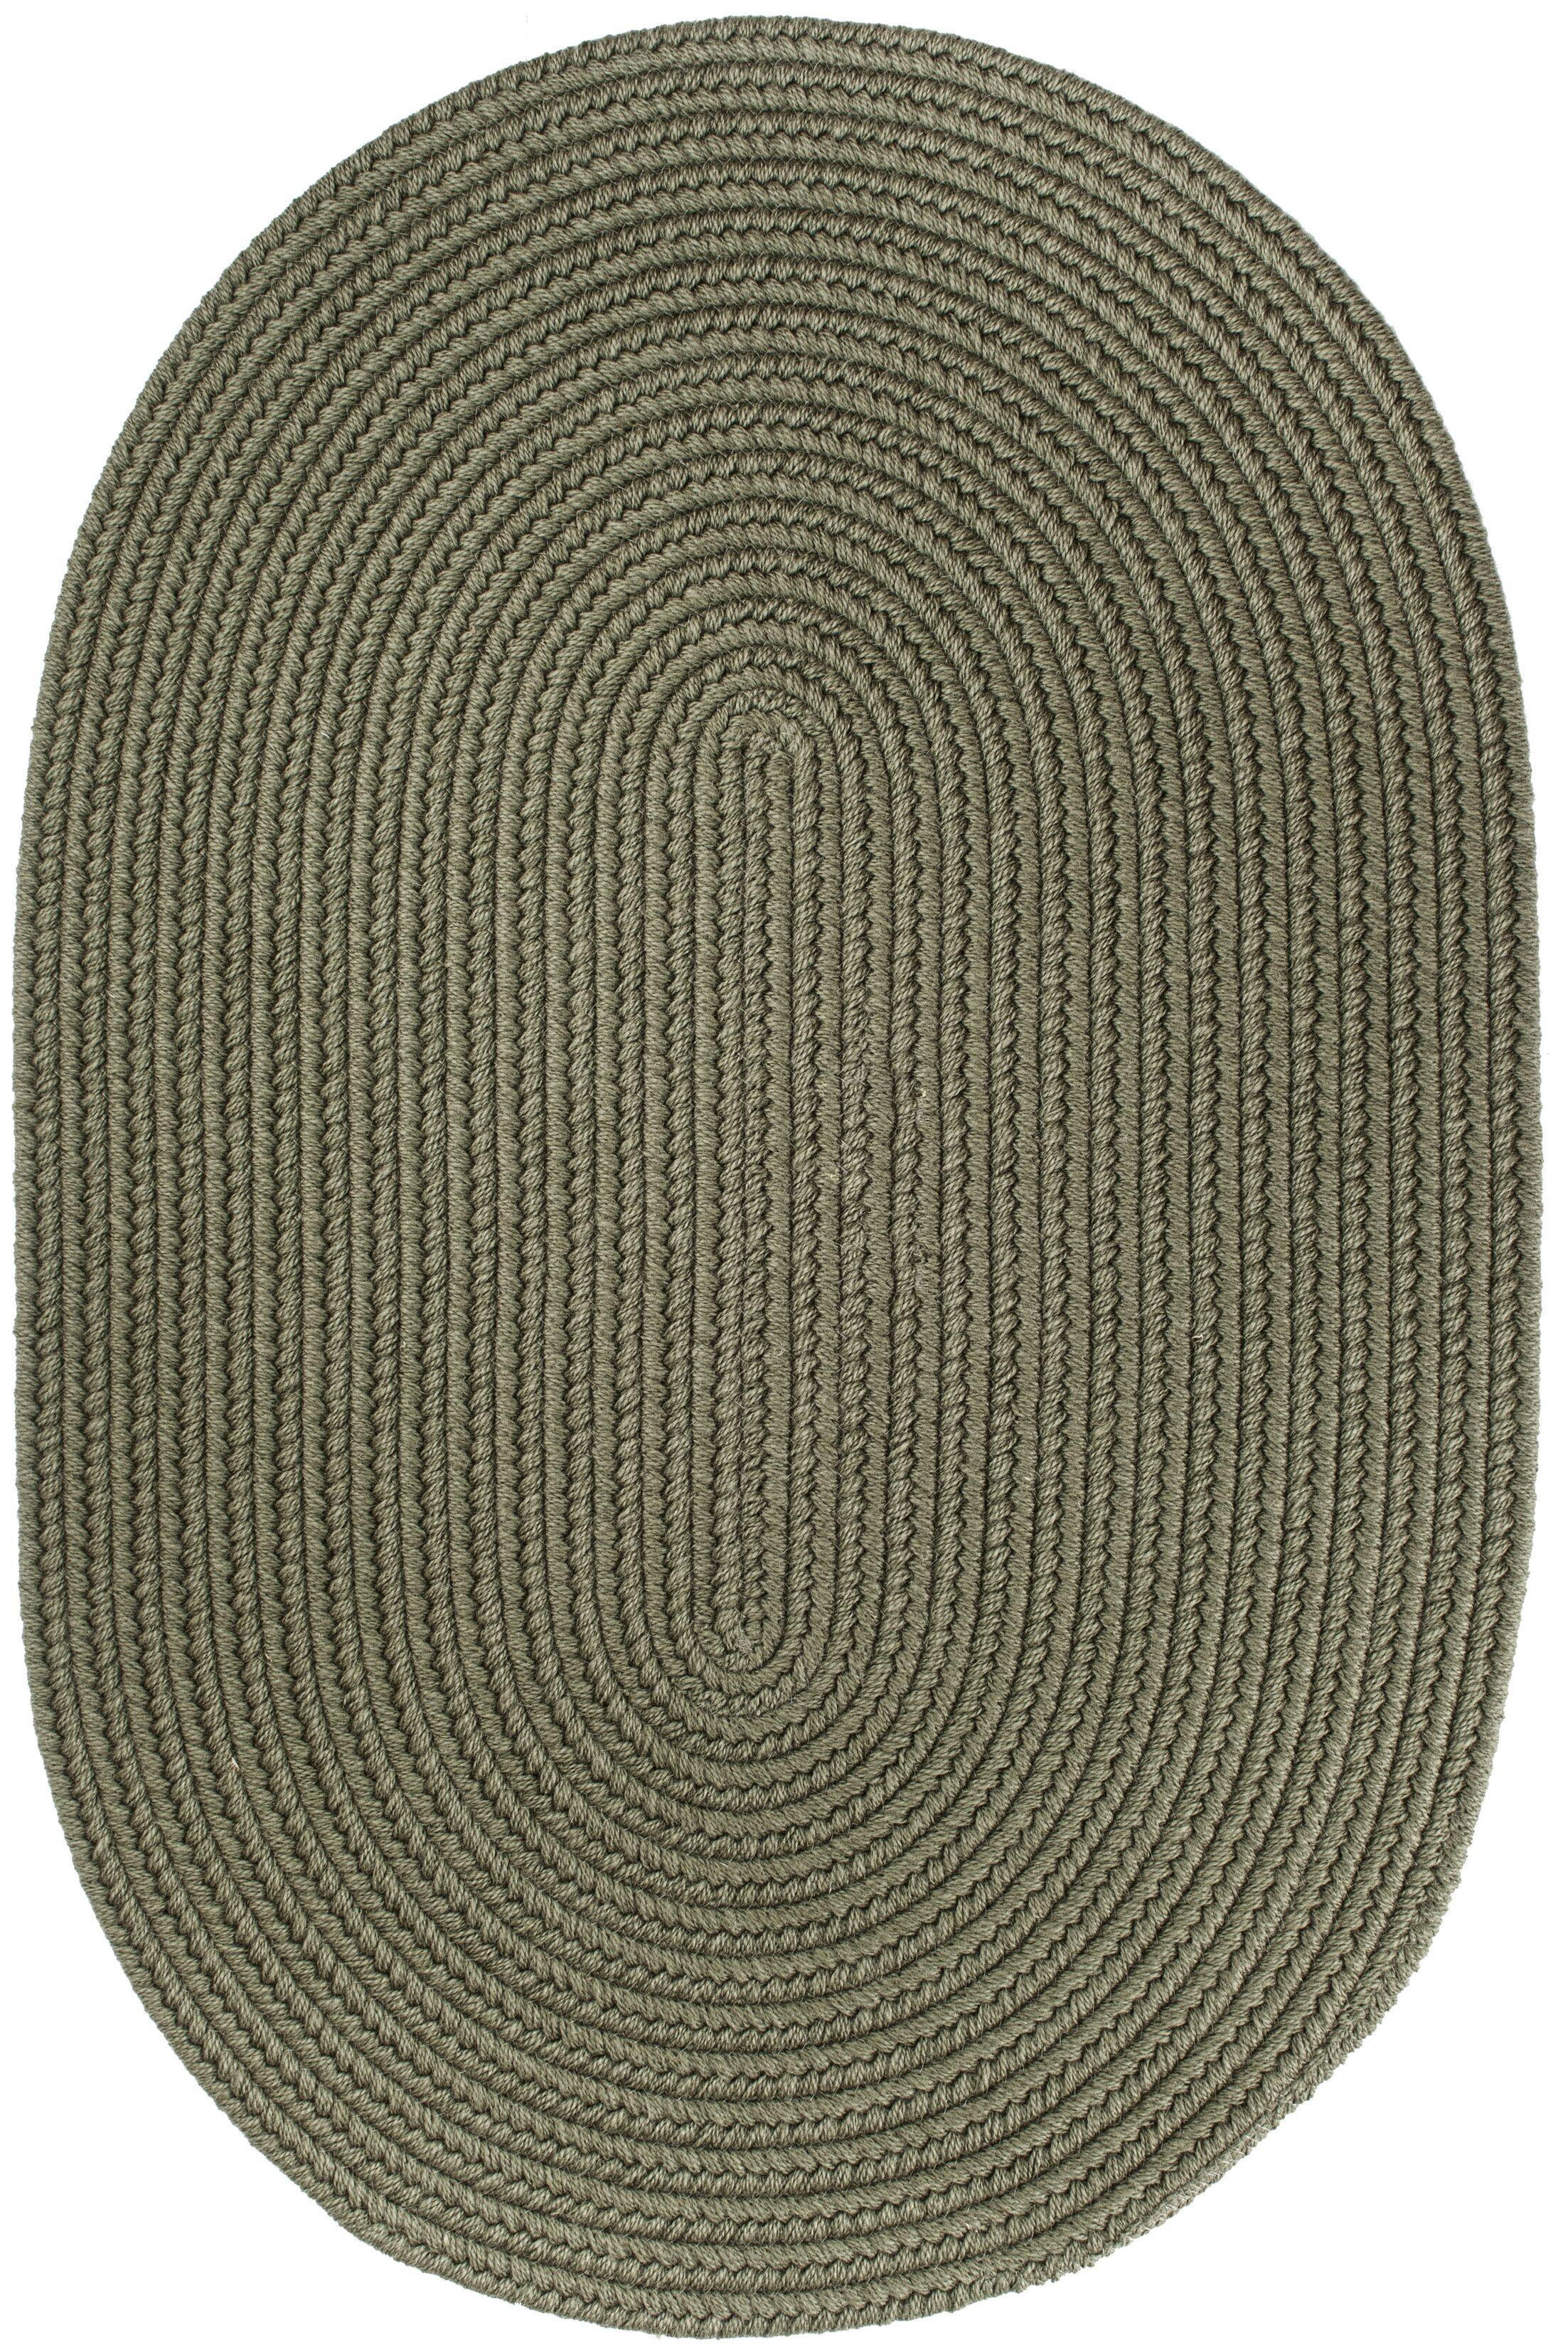 Handmade Moss Green Area Rug Rug Size: Oval 10' x 13'